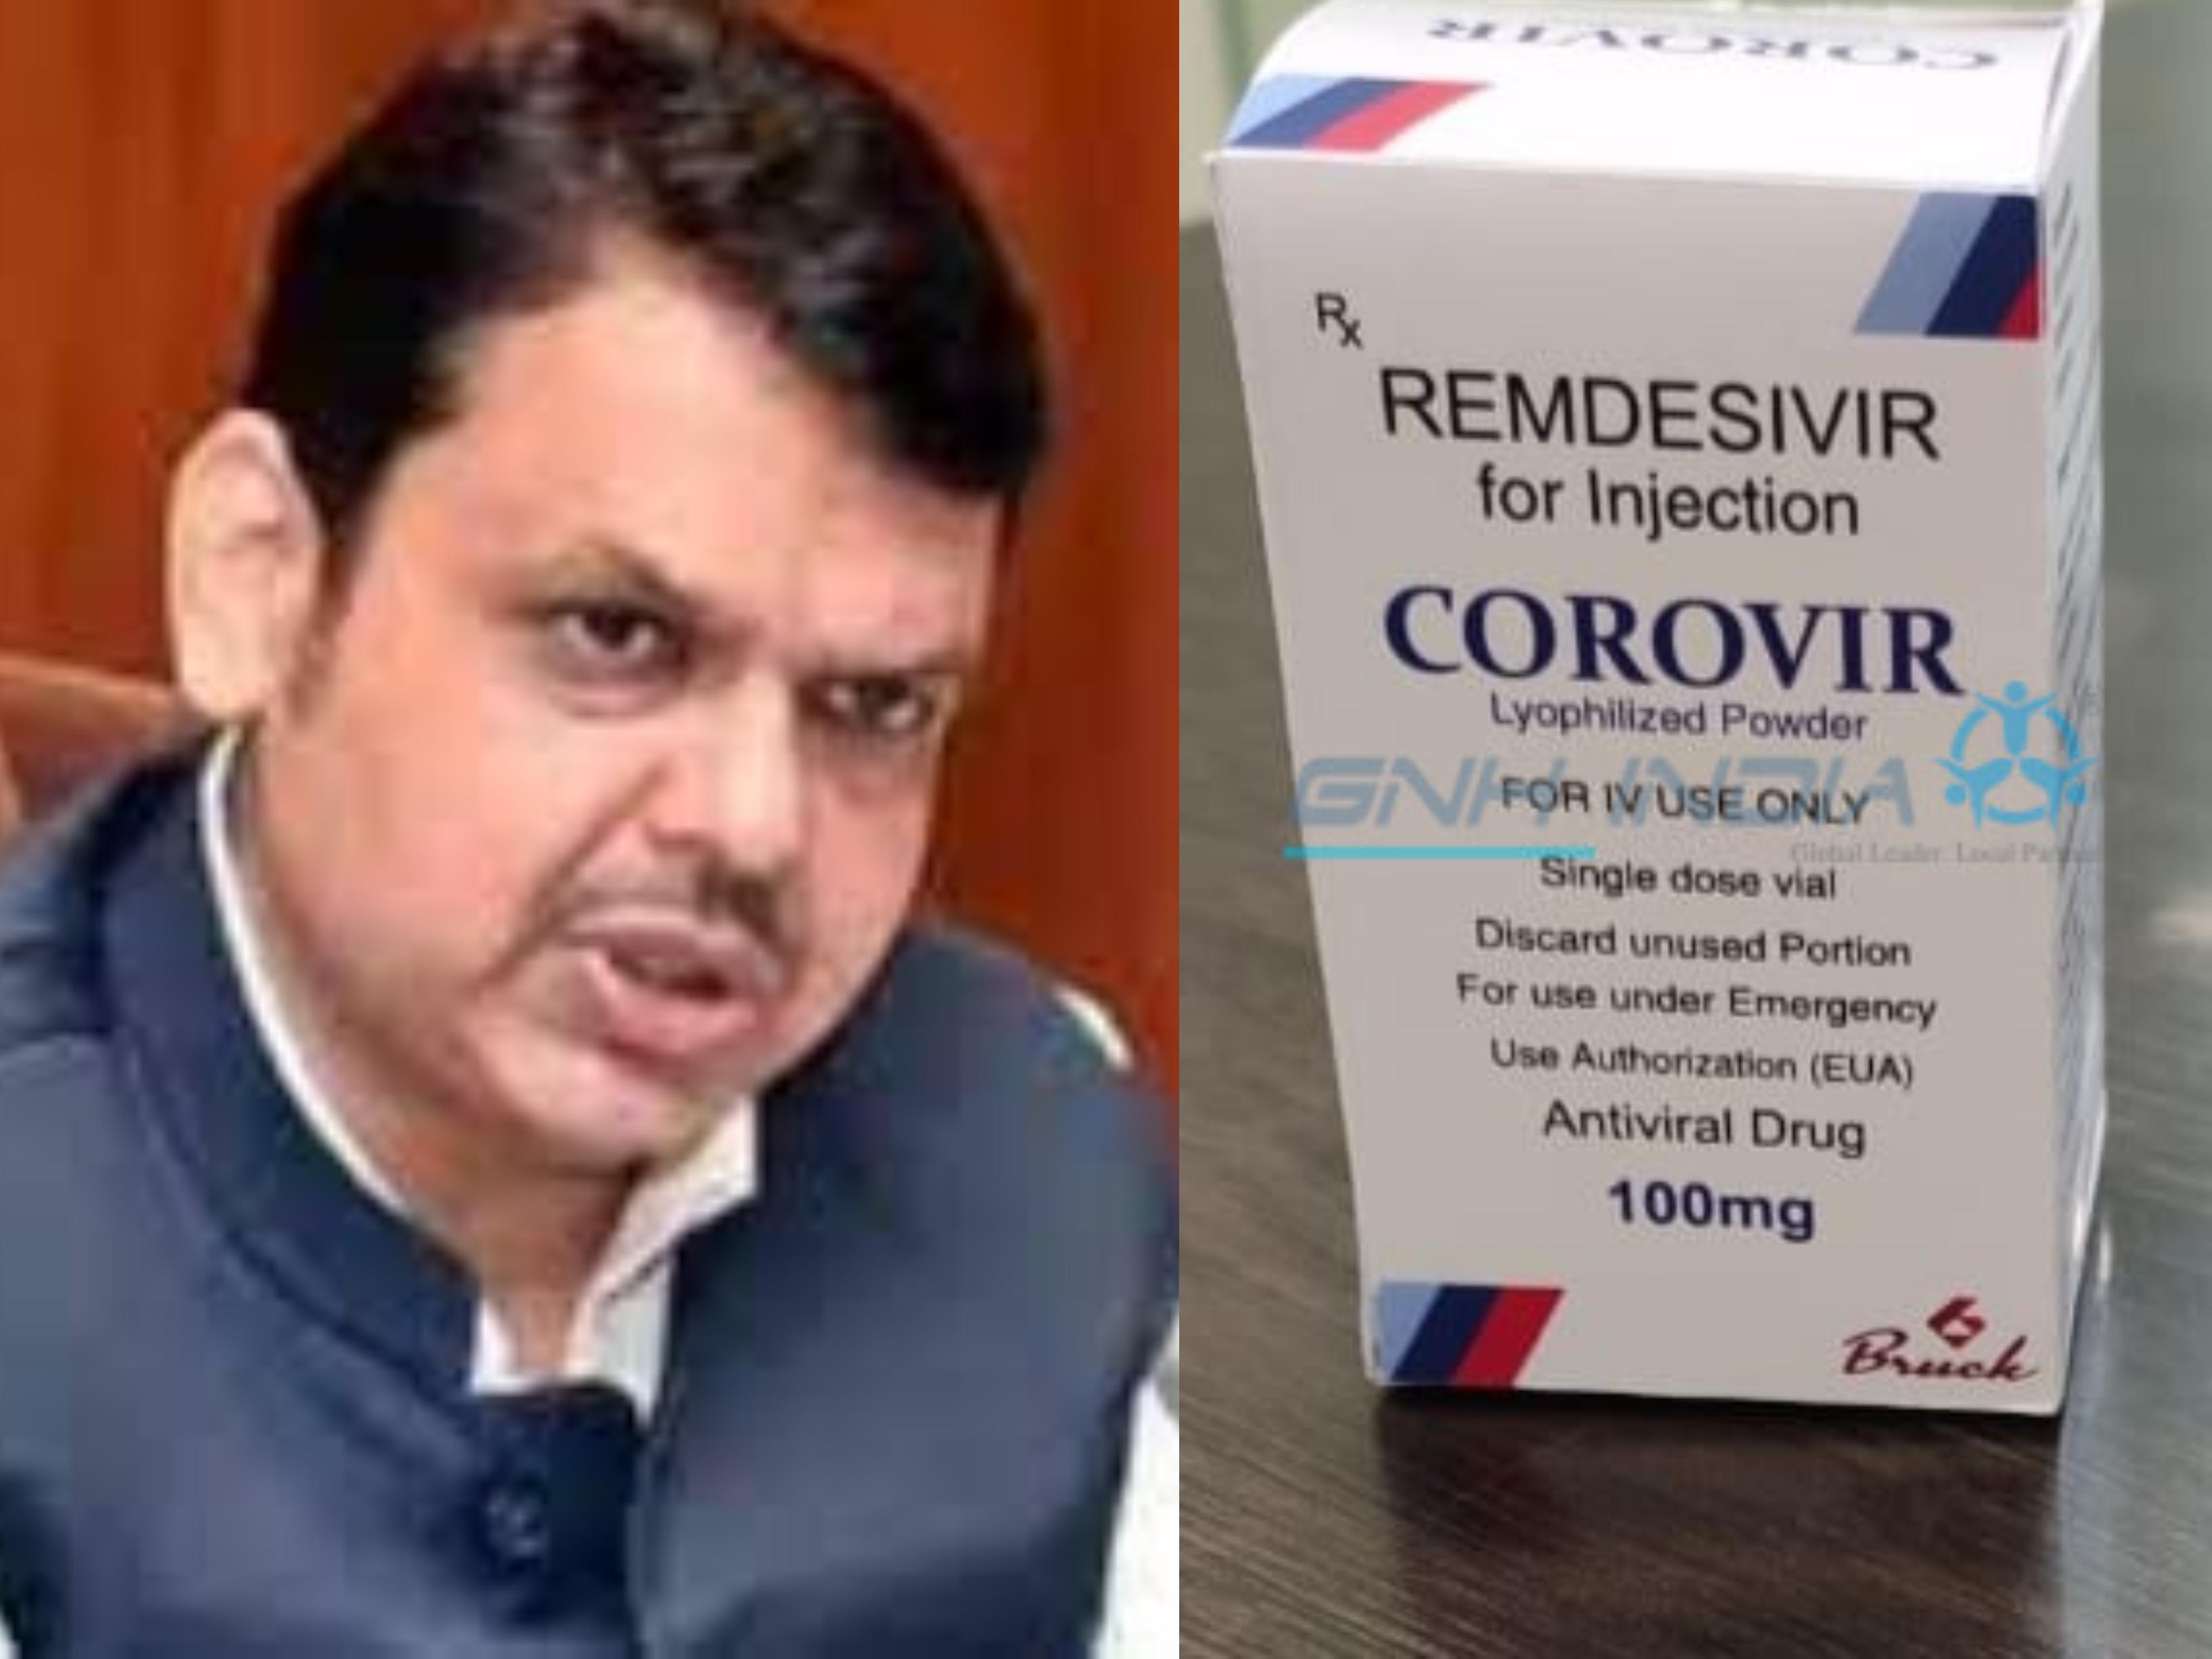 Bruck Pharma: Why Is Devendra Fadnavis So Interested?